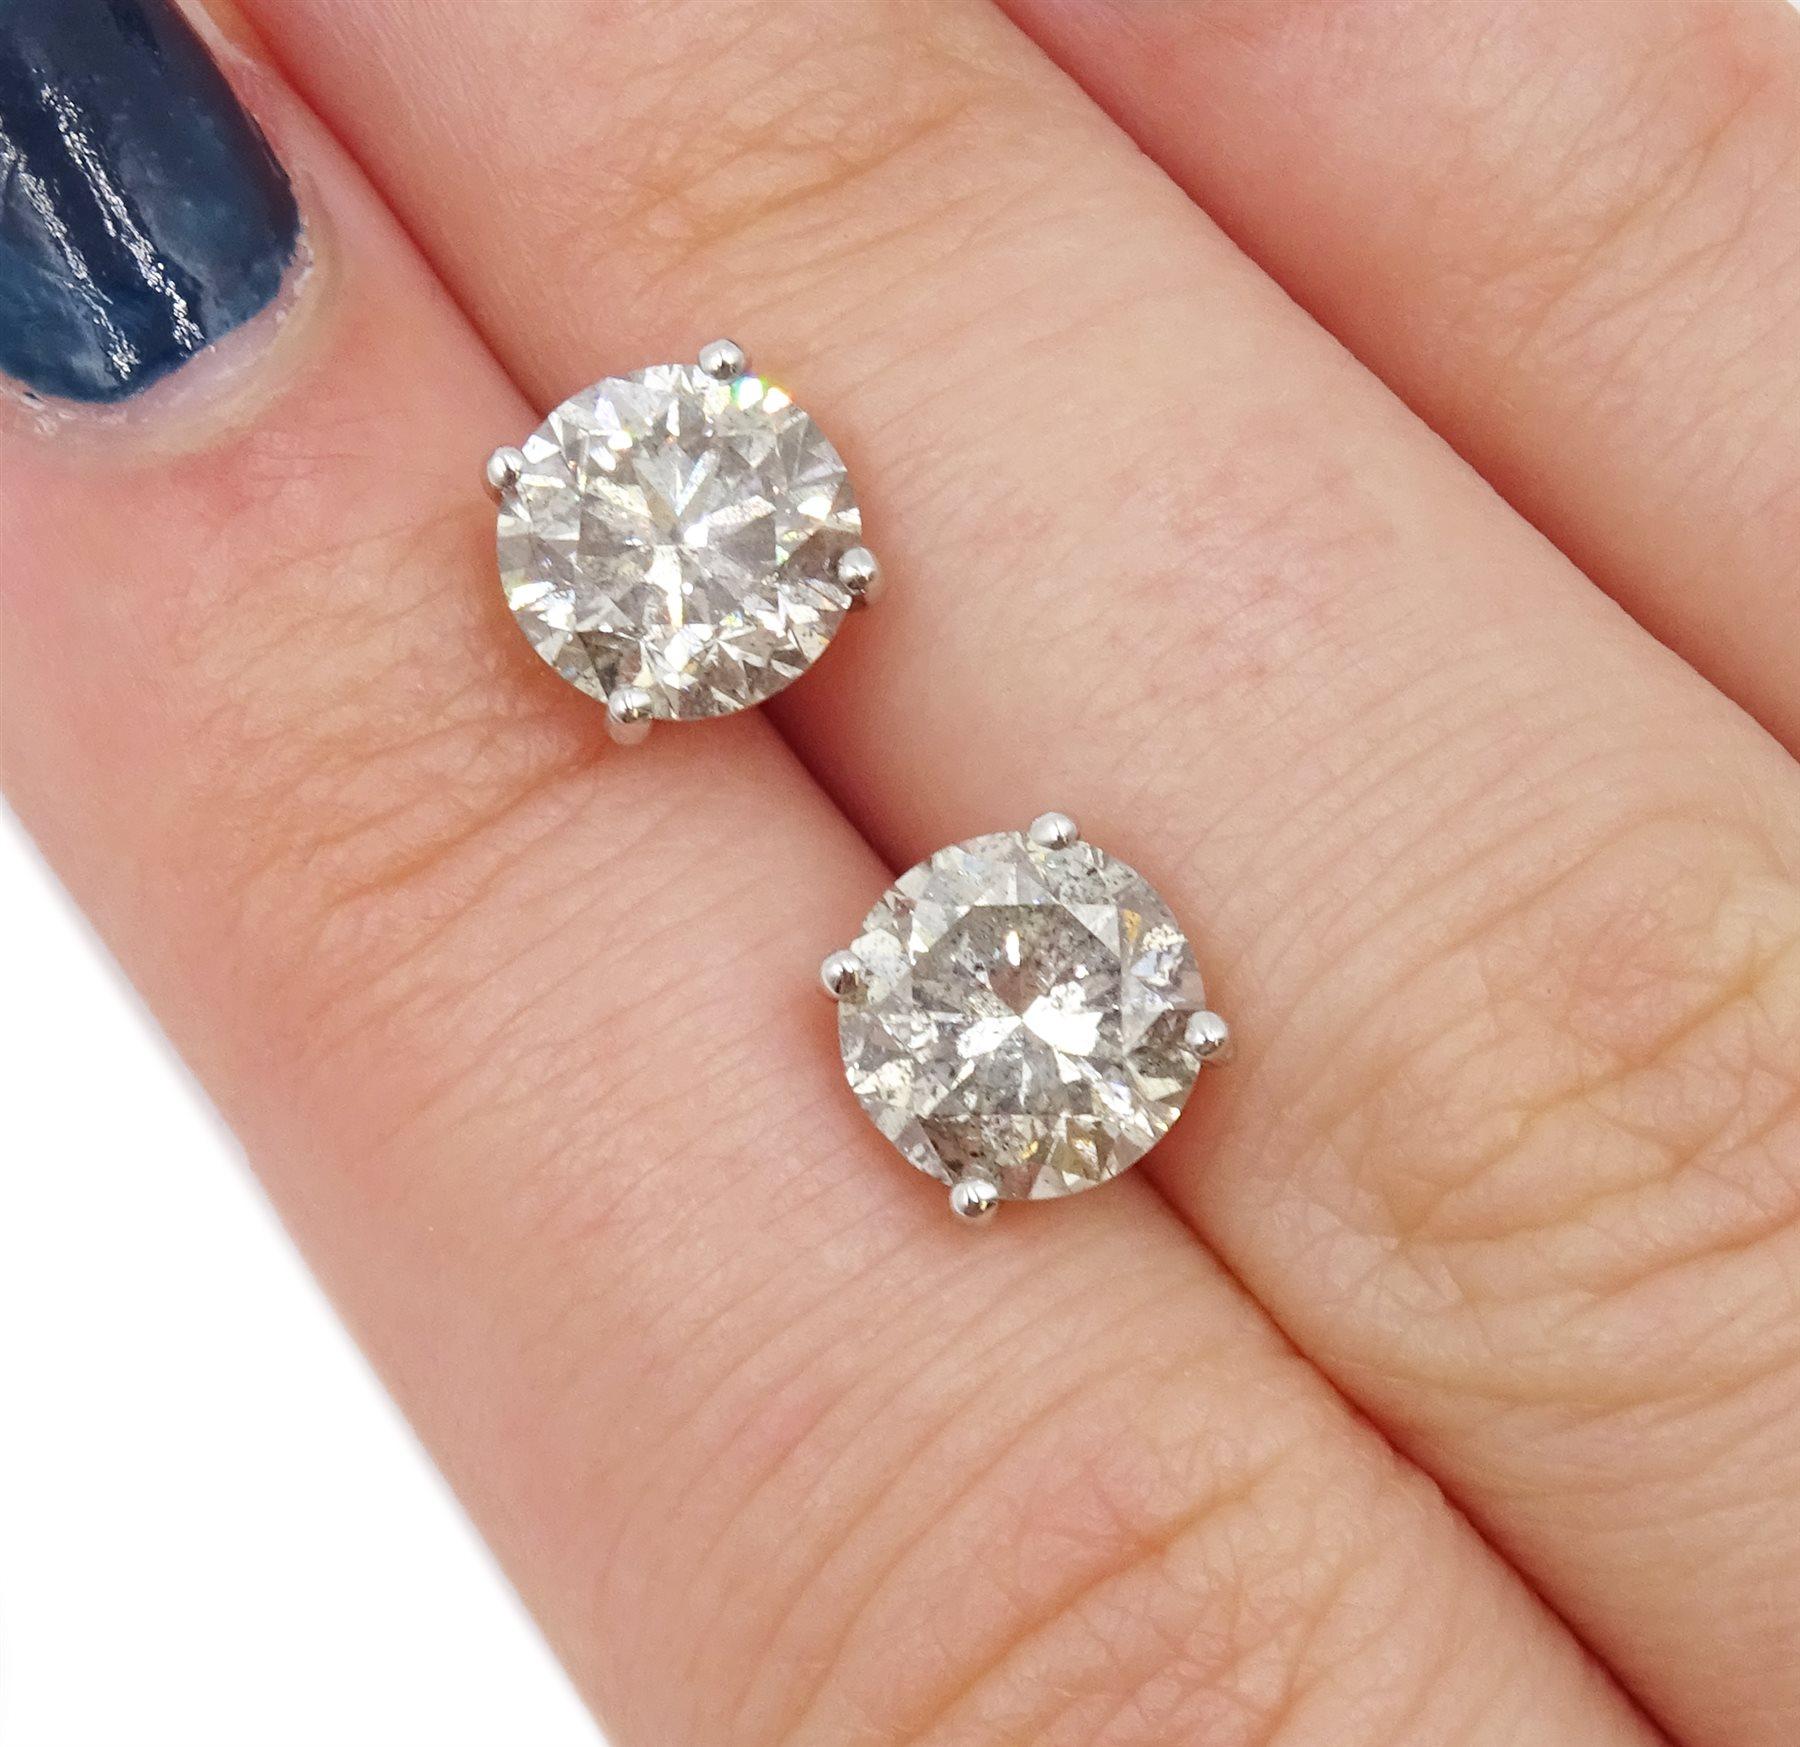 Pair of 18ct white gold diamond stud earrings, stamped 750, diamond total weight 3.52 carat, free UK - Image 4 of 4